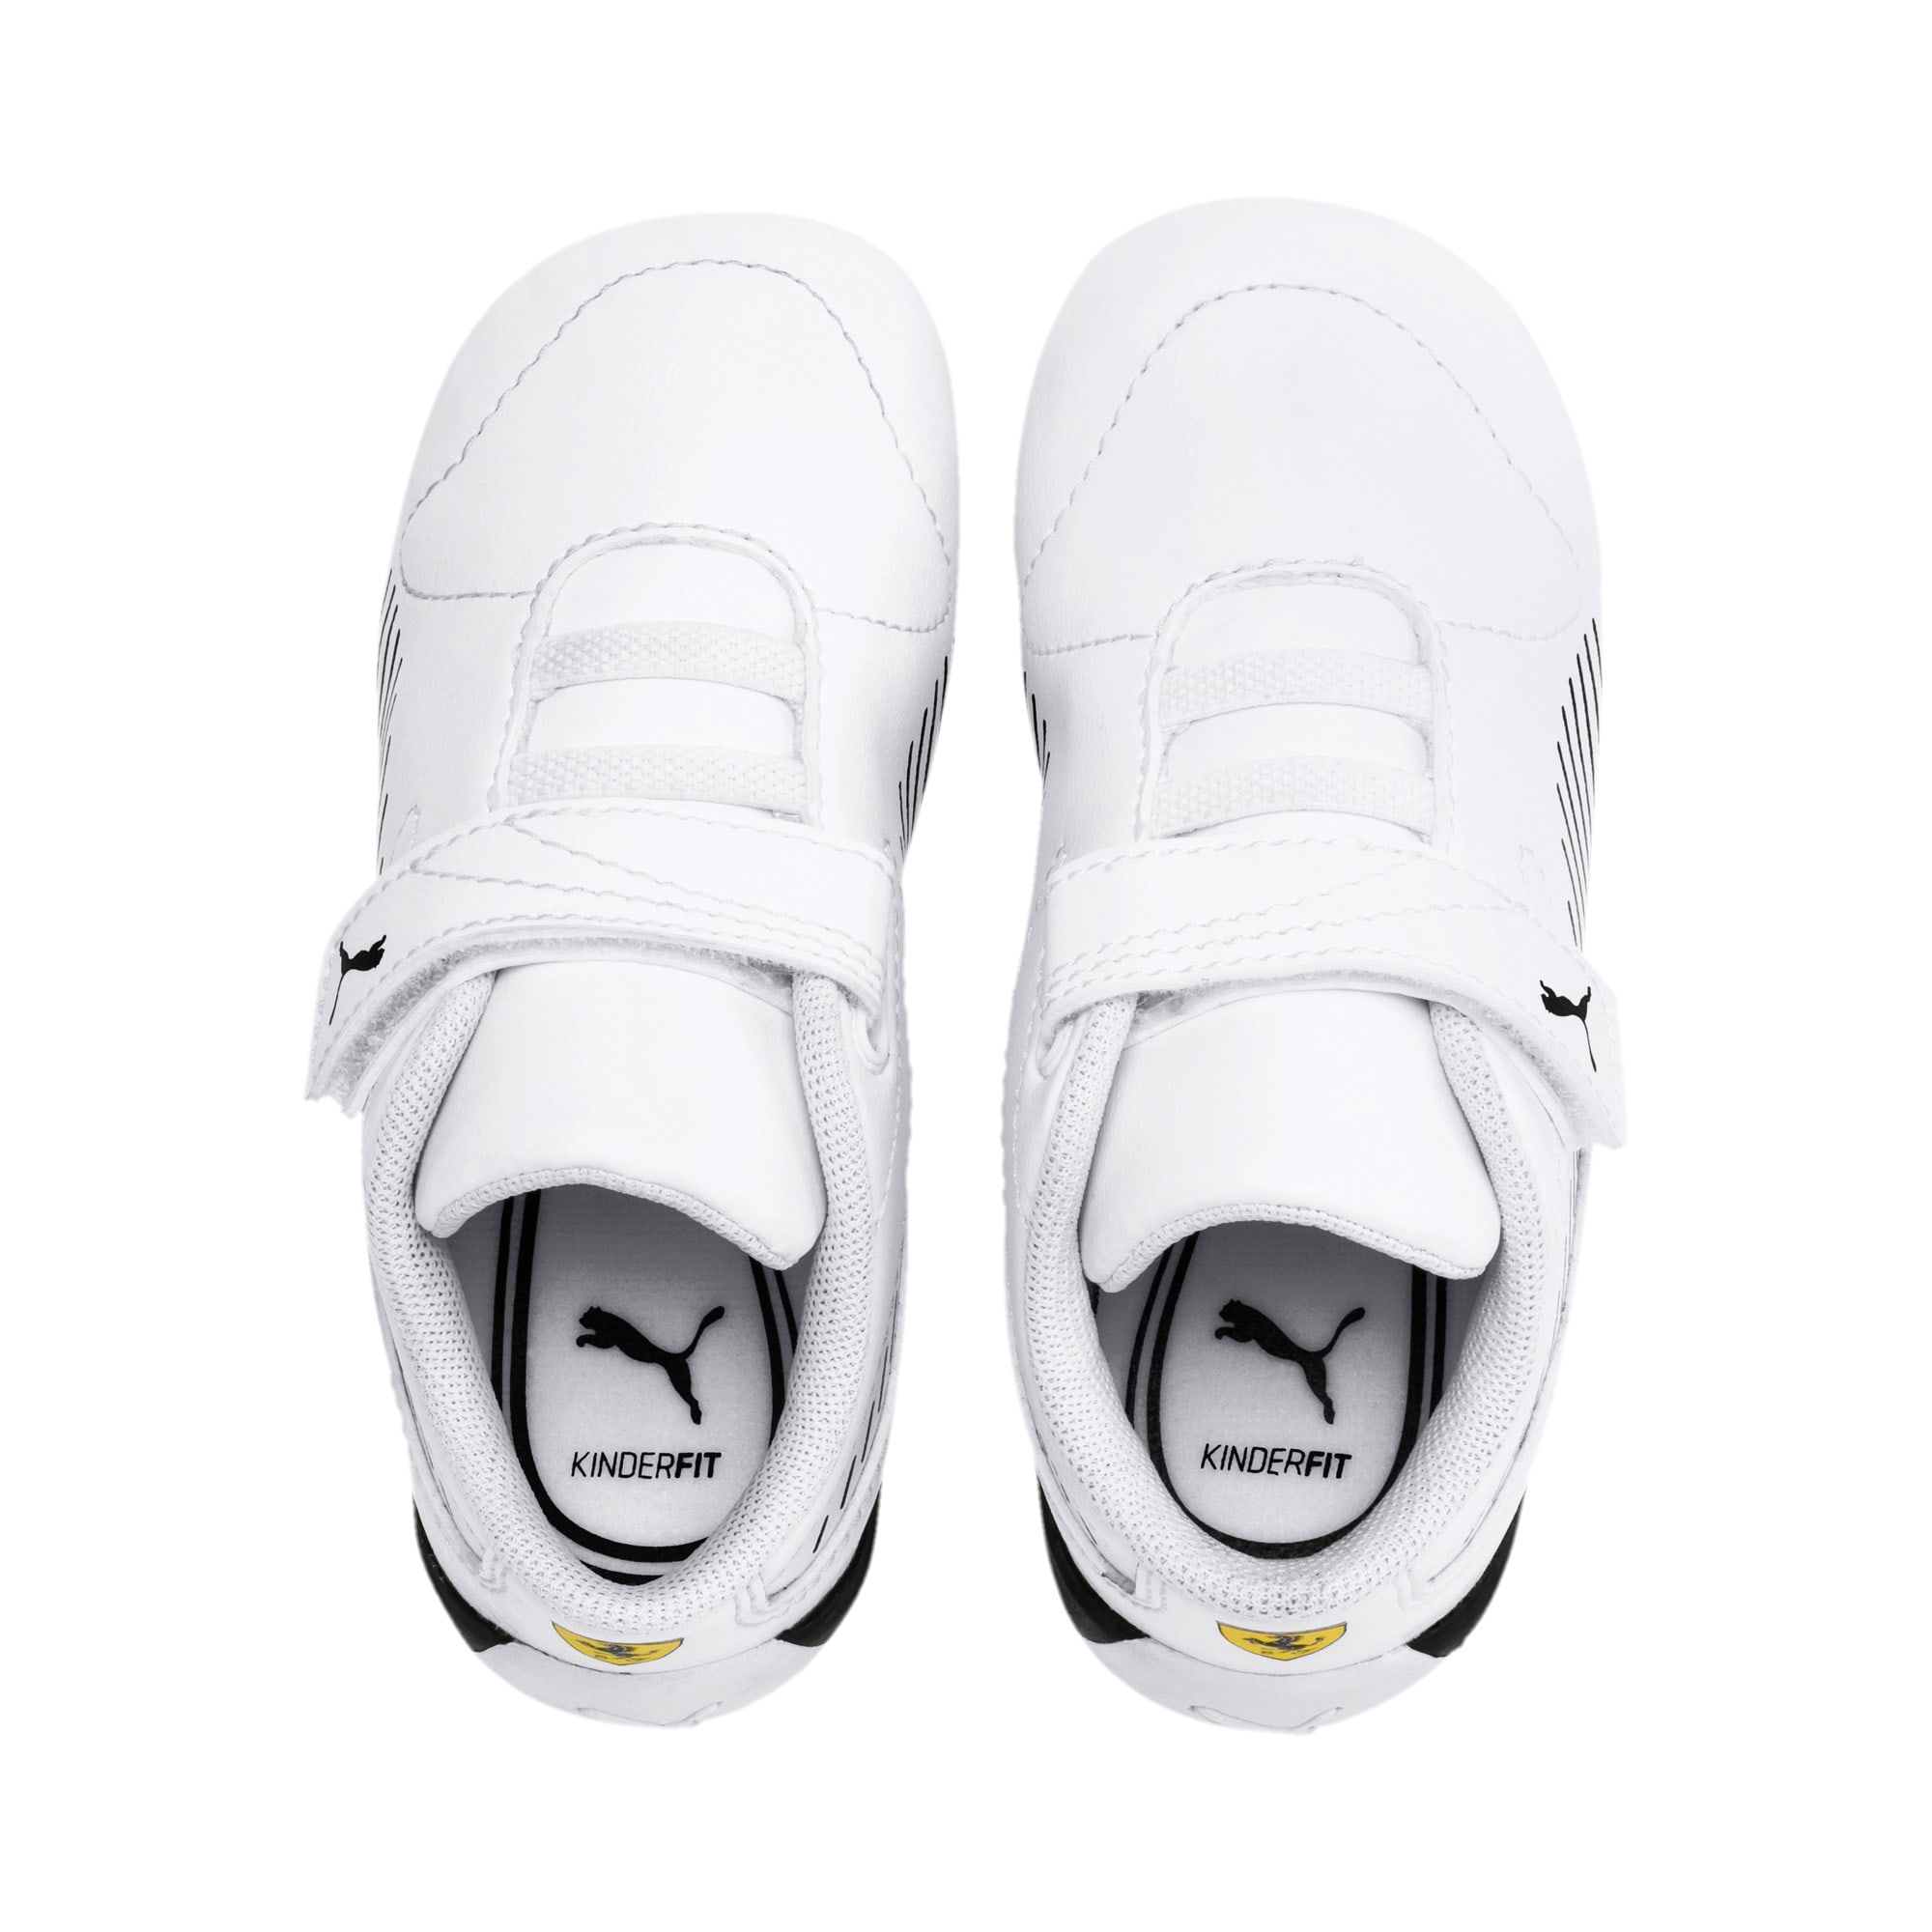 Thumbnail 6 of Scuderia Ferrari Drift Cat 7S Ultra Toddler Shoes, Puma White-Puma Black, medium